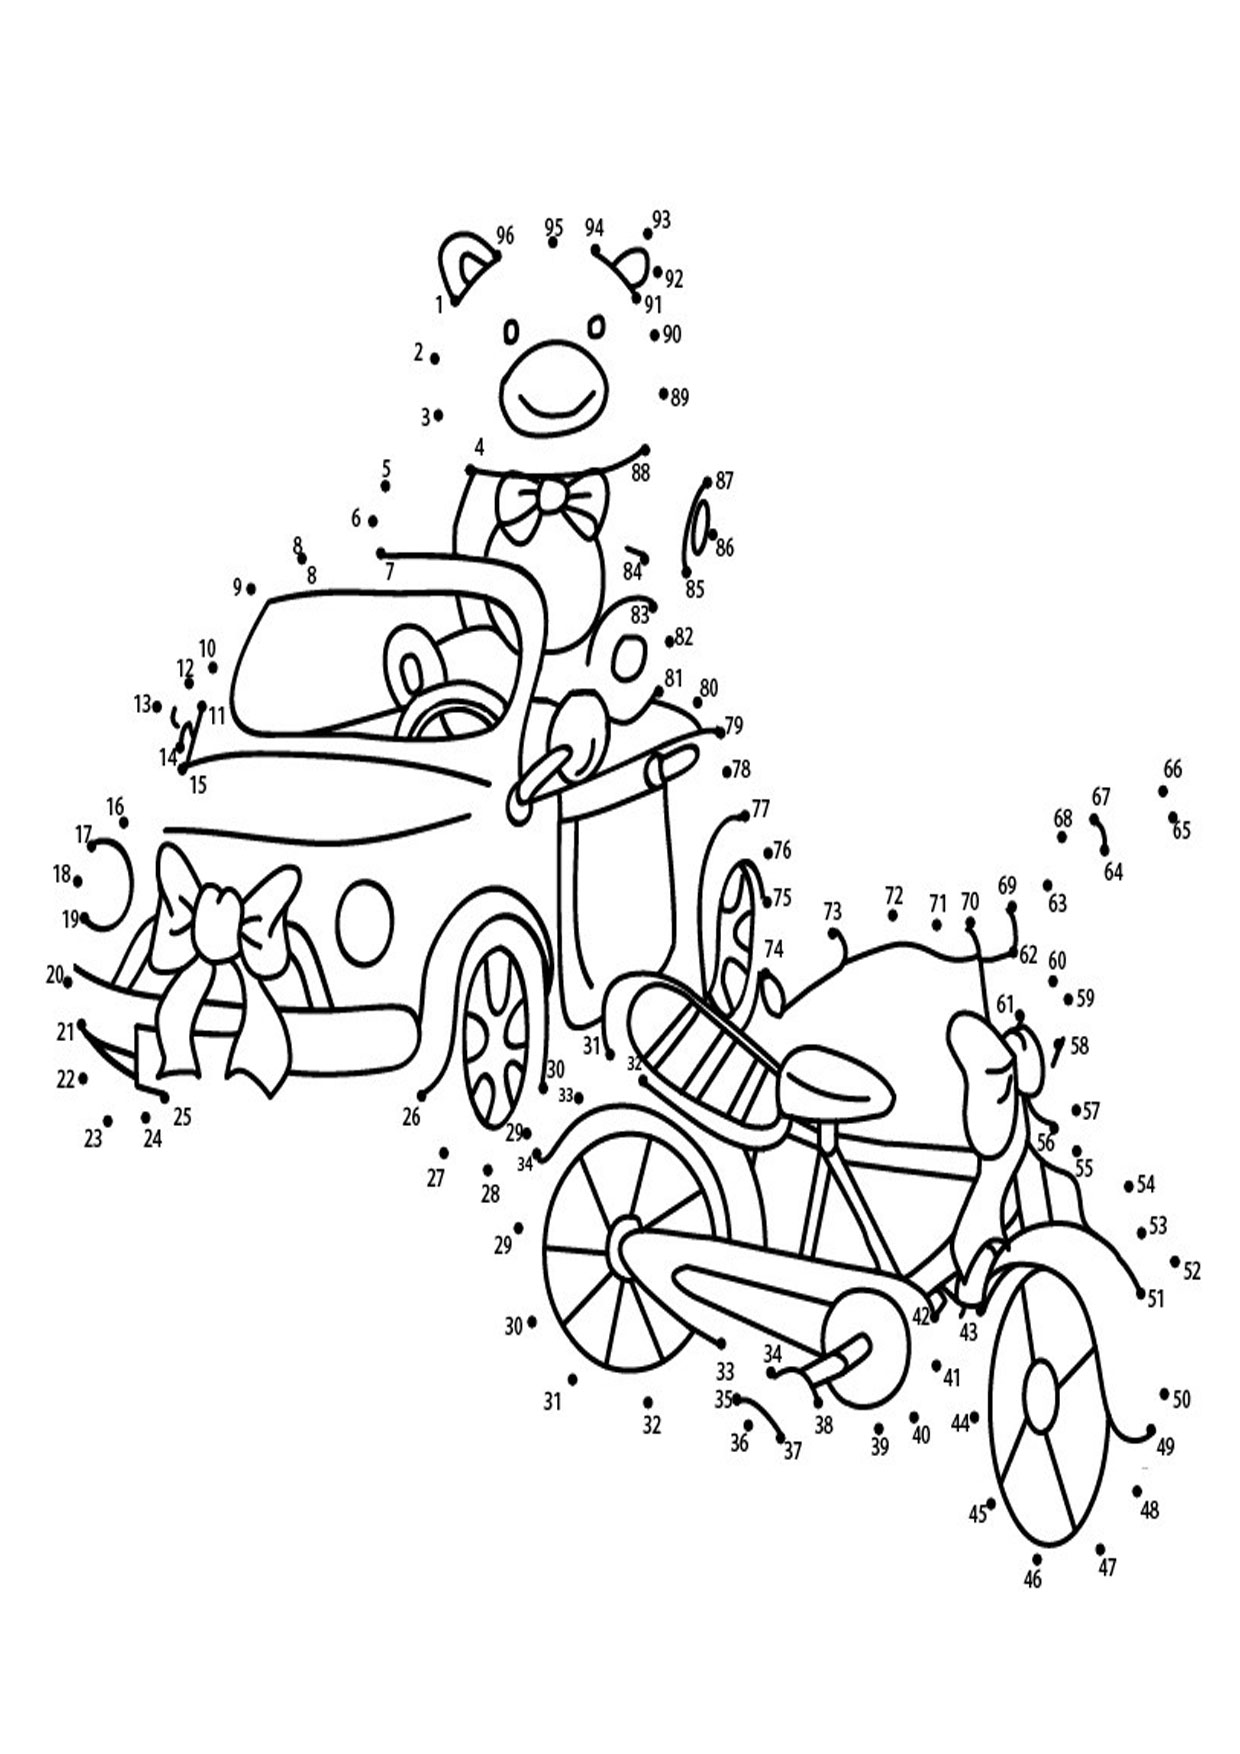 30 disegni unisci i puntini dedicati al natale per bambini